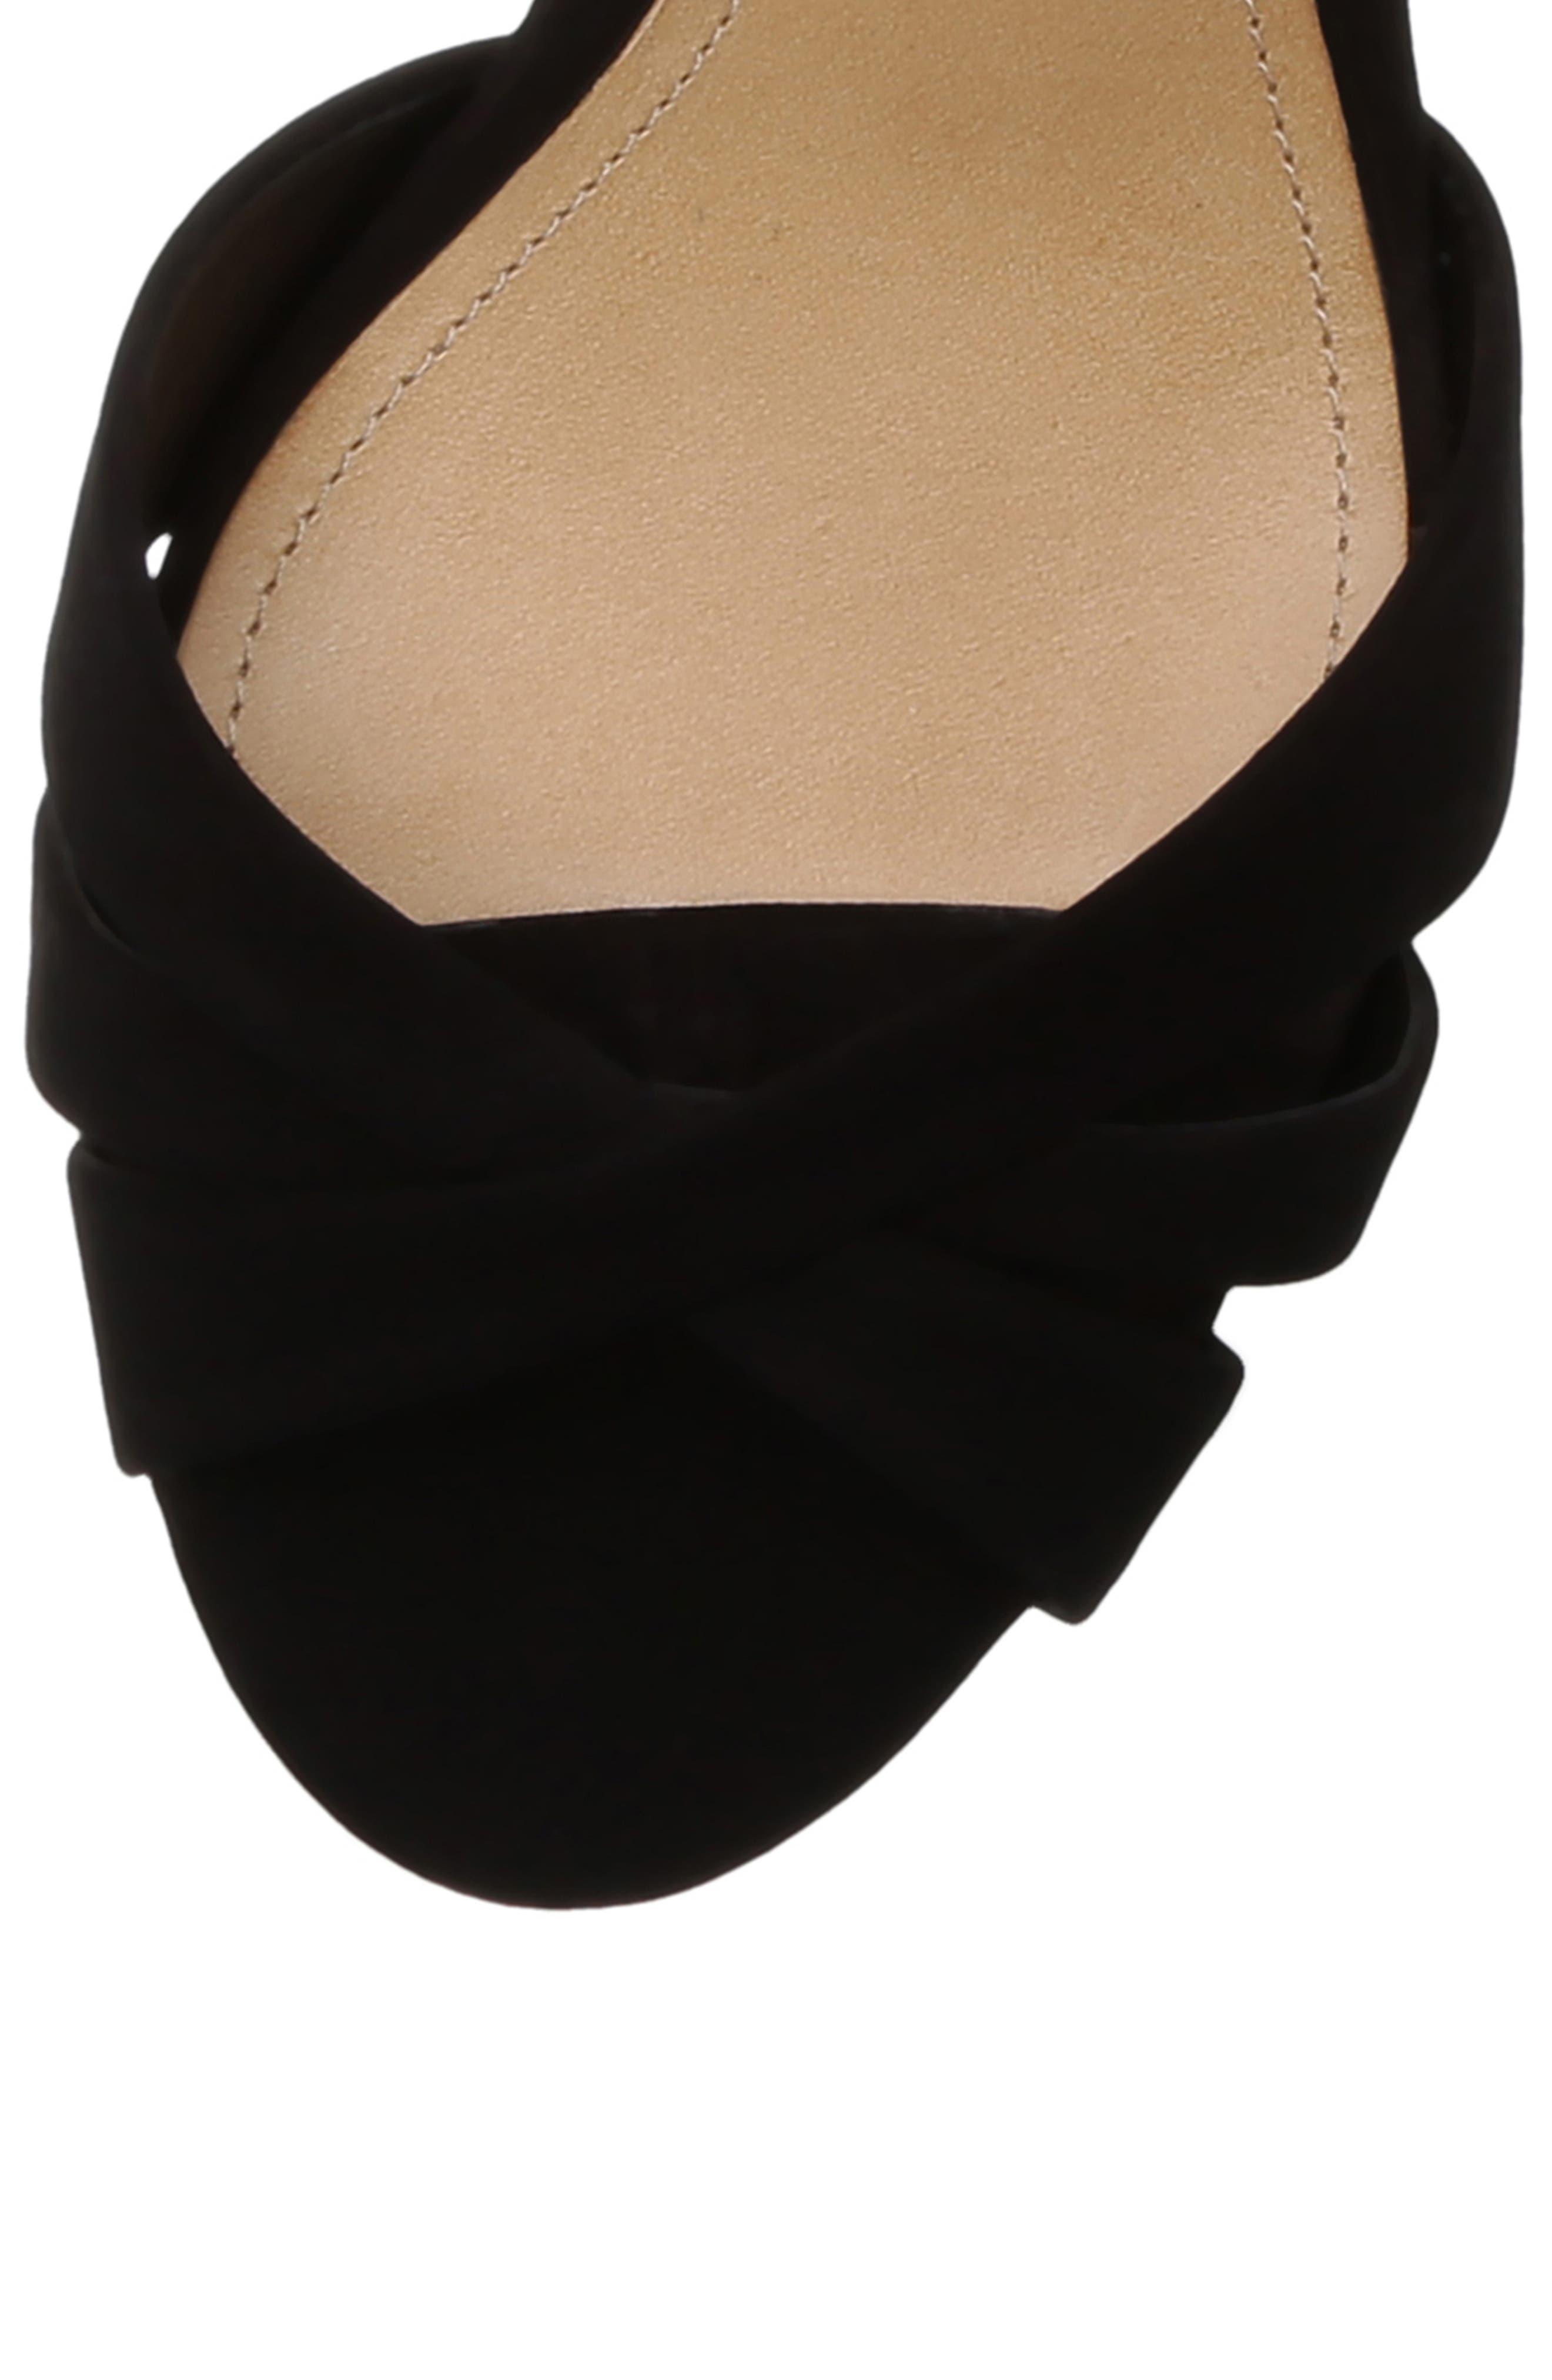 SCHUTZ, Keefa Platform Sandal, Alternate thumbnail 5, color, BLACK NUBUCK LEATHER